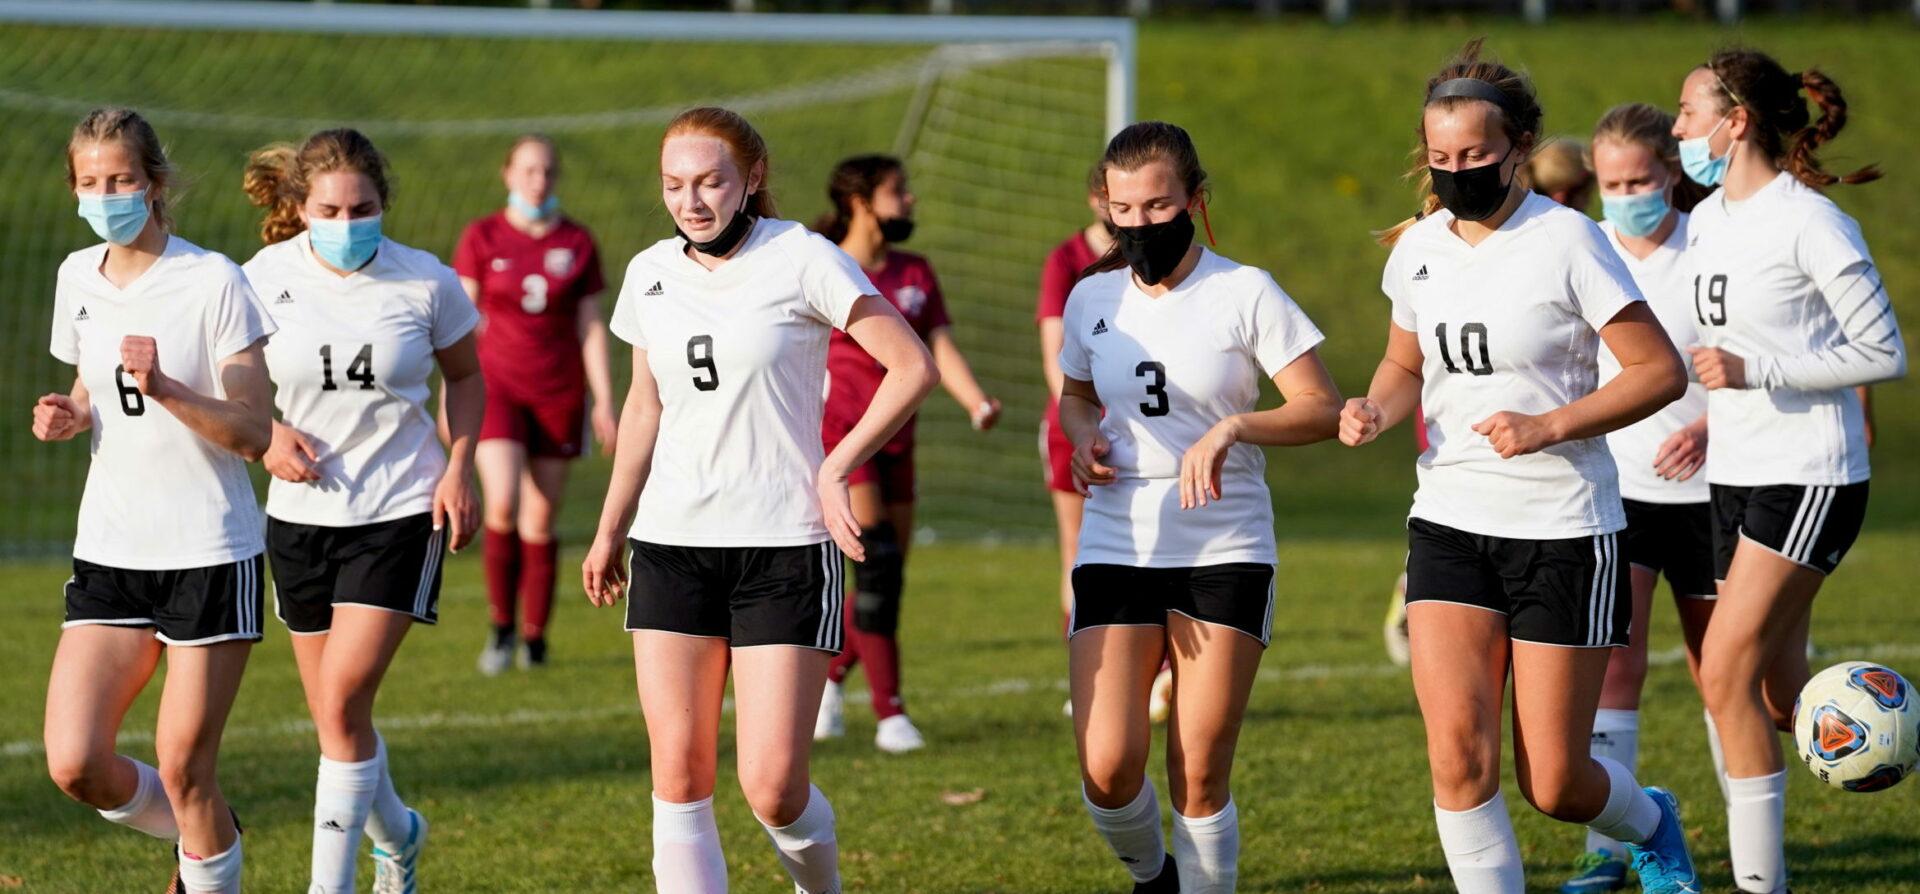 Wietrzykowski scores three goals as Ludington soccer team shuts down previously unbeaten Orchard View 8-0